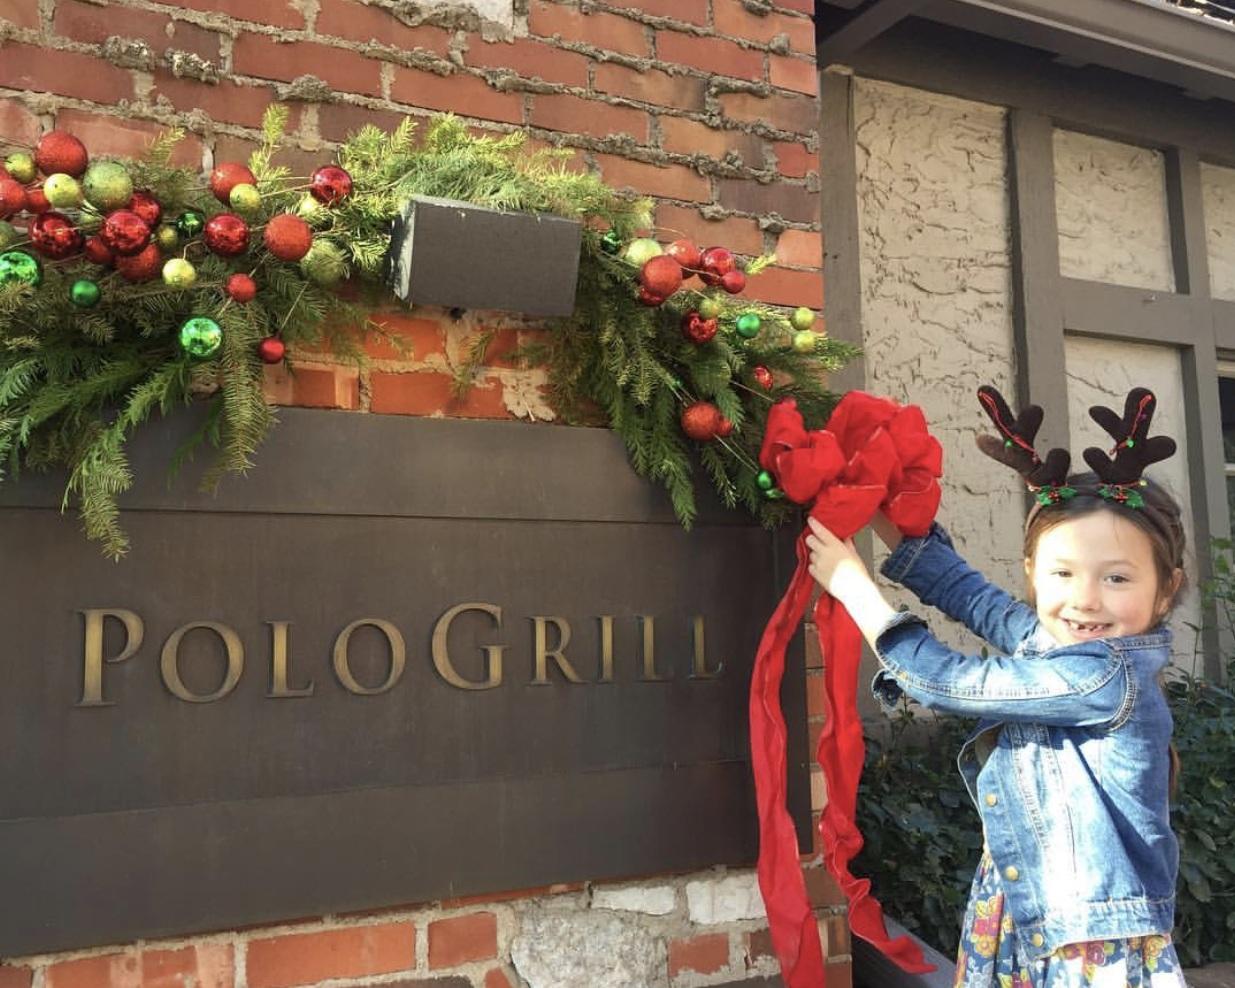 Polo_Grill_Sign_Girl.jpg